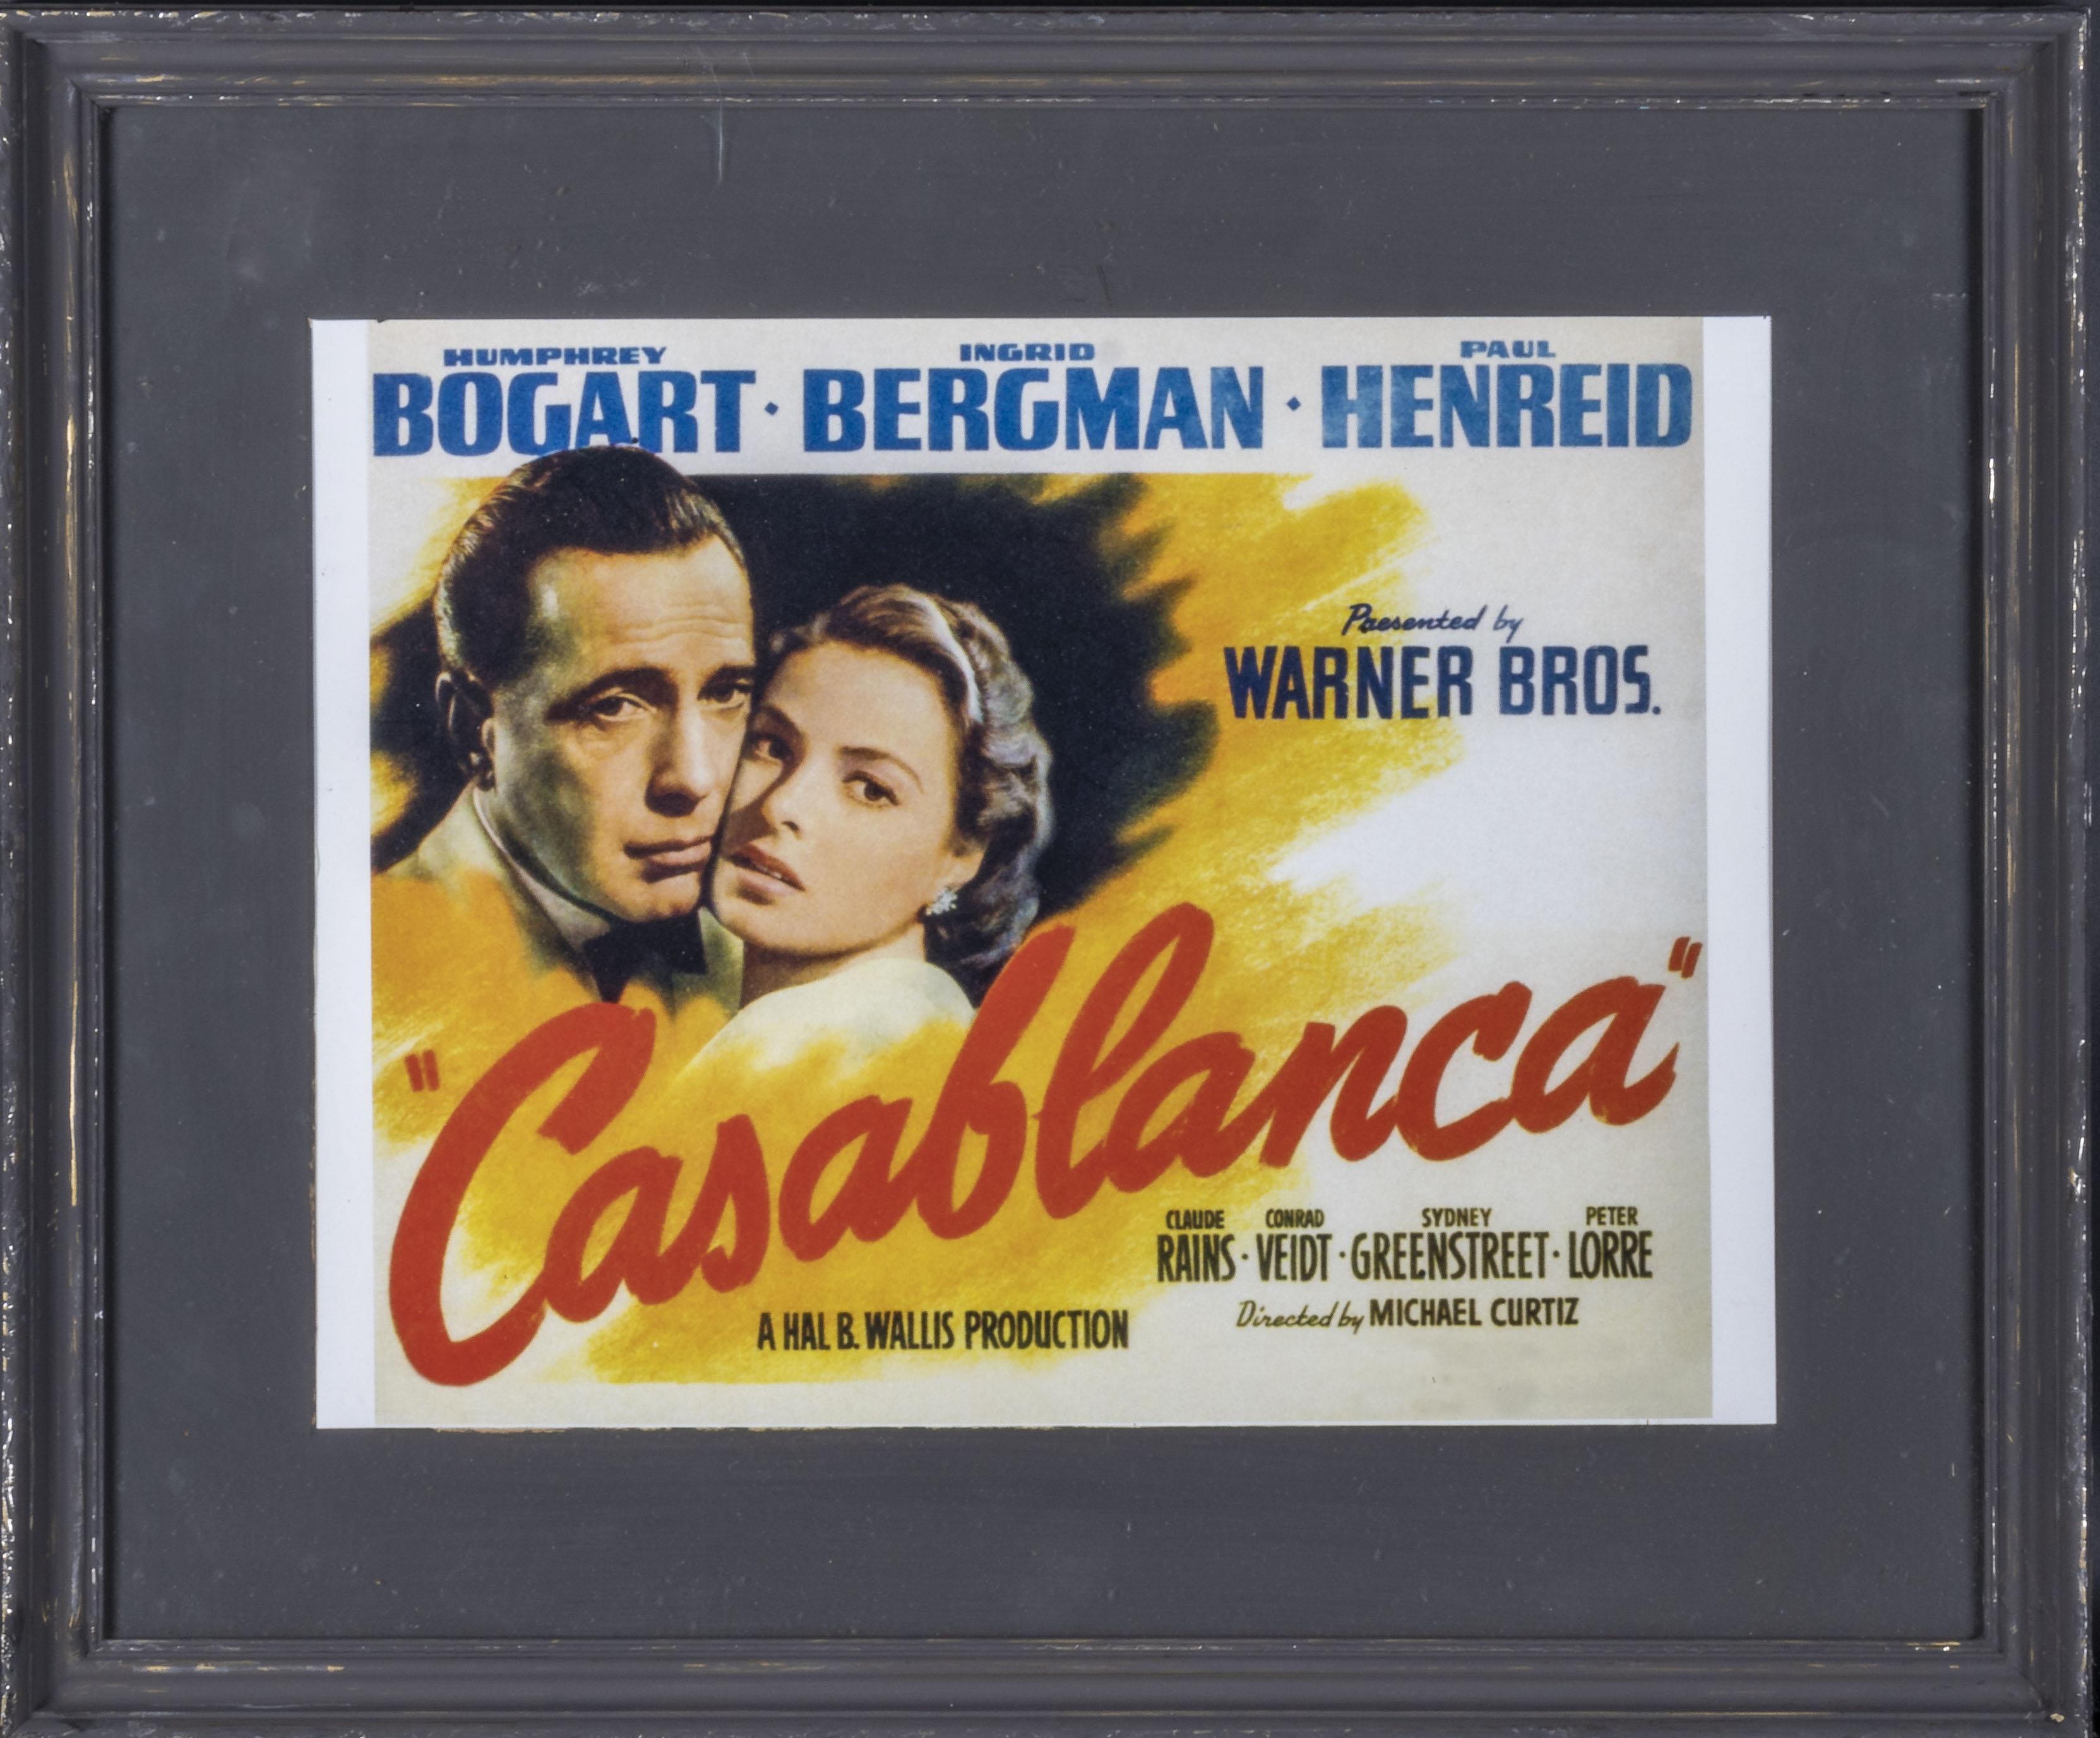 Tw framed advertising prints 'Casablanca' 38cm x 45cm and 'The Birds' 34cm x 44cm - Image 2 of 3